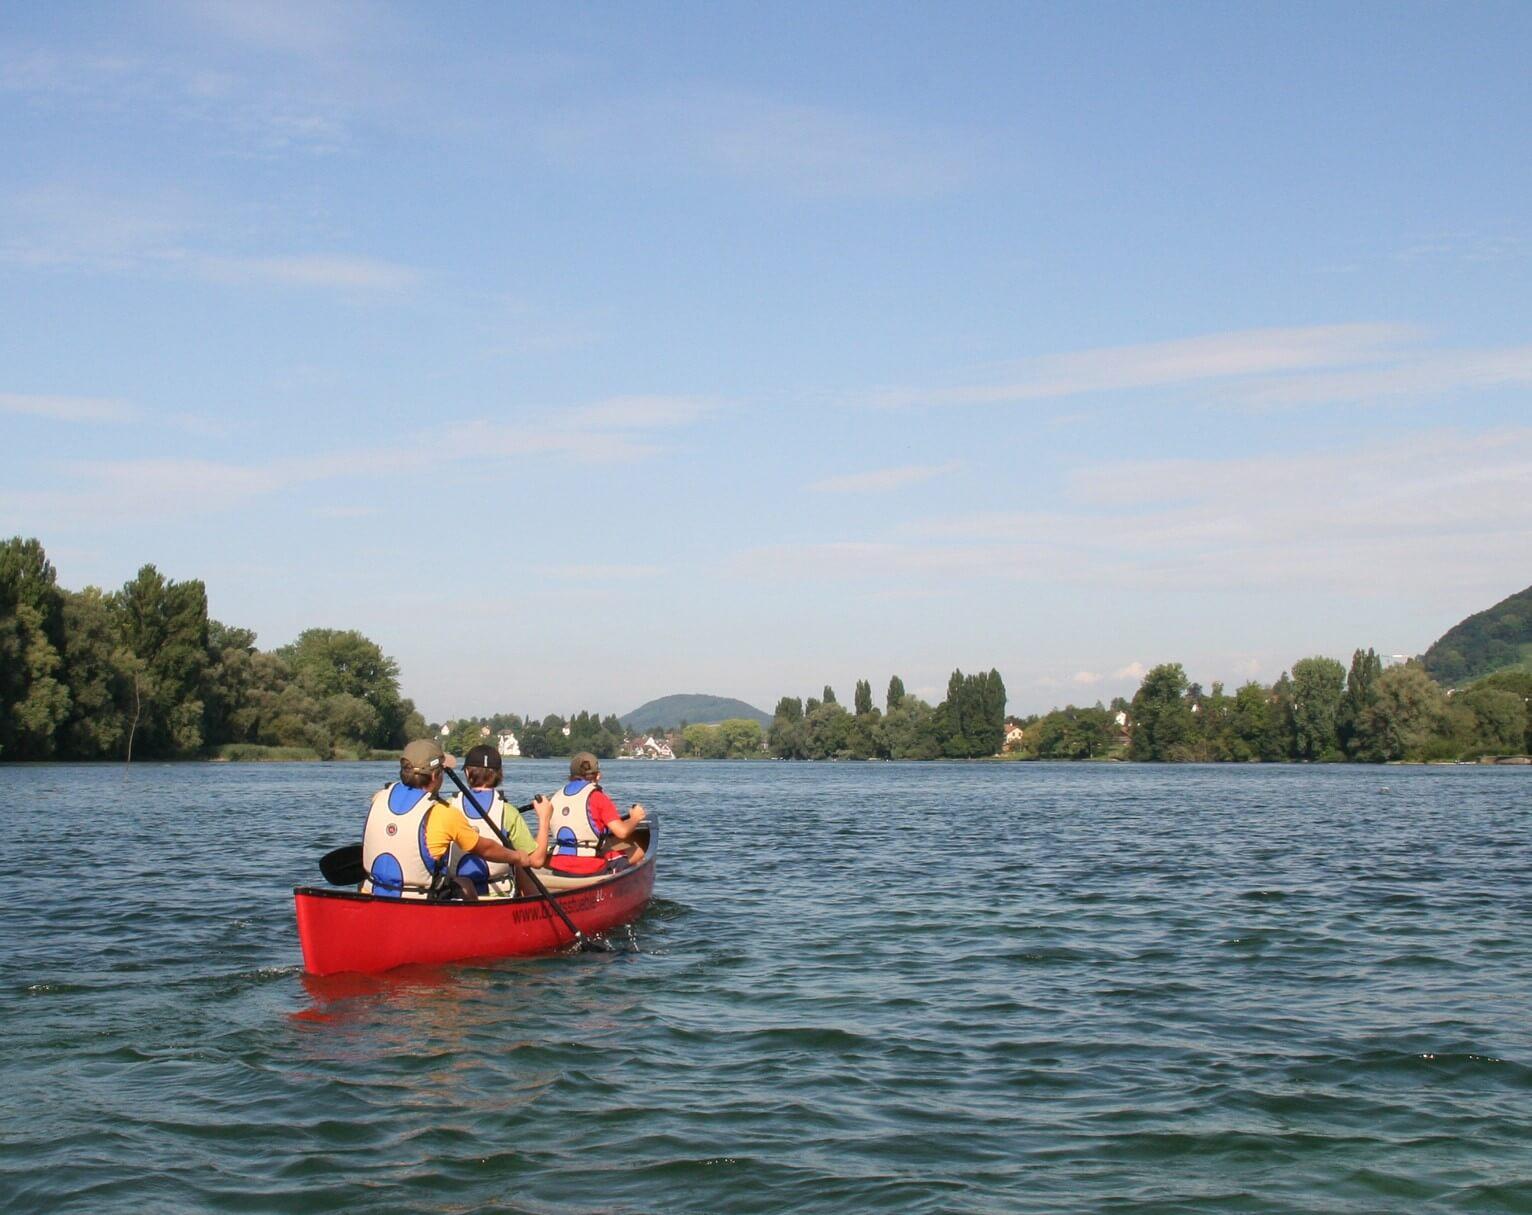 Kajaktour: Auf dem Bodensee